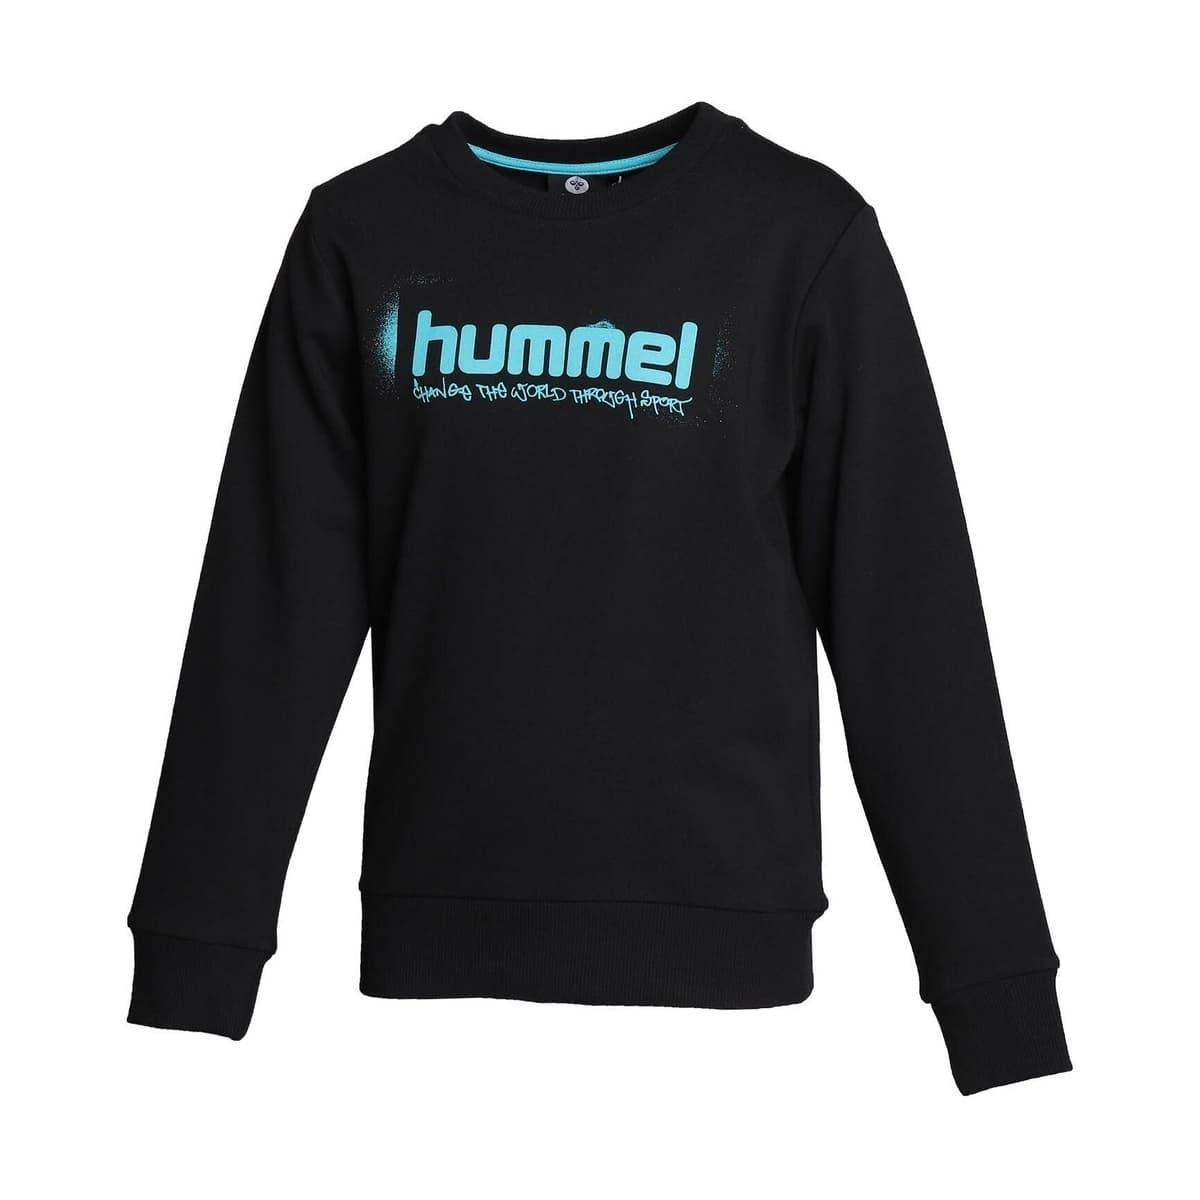 Hummel Neo Çocuk Siyah Sweatshirt (921302-2001)